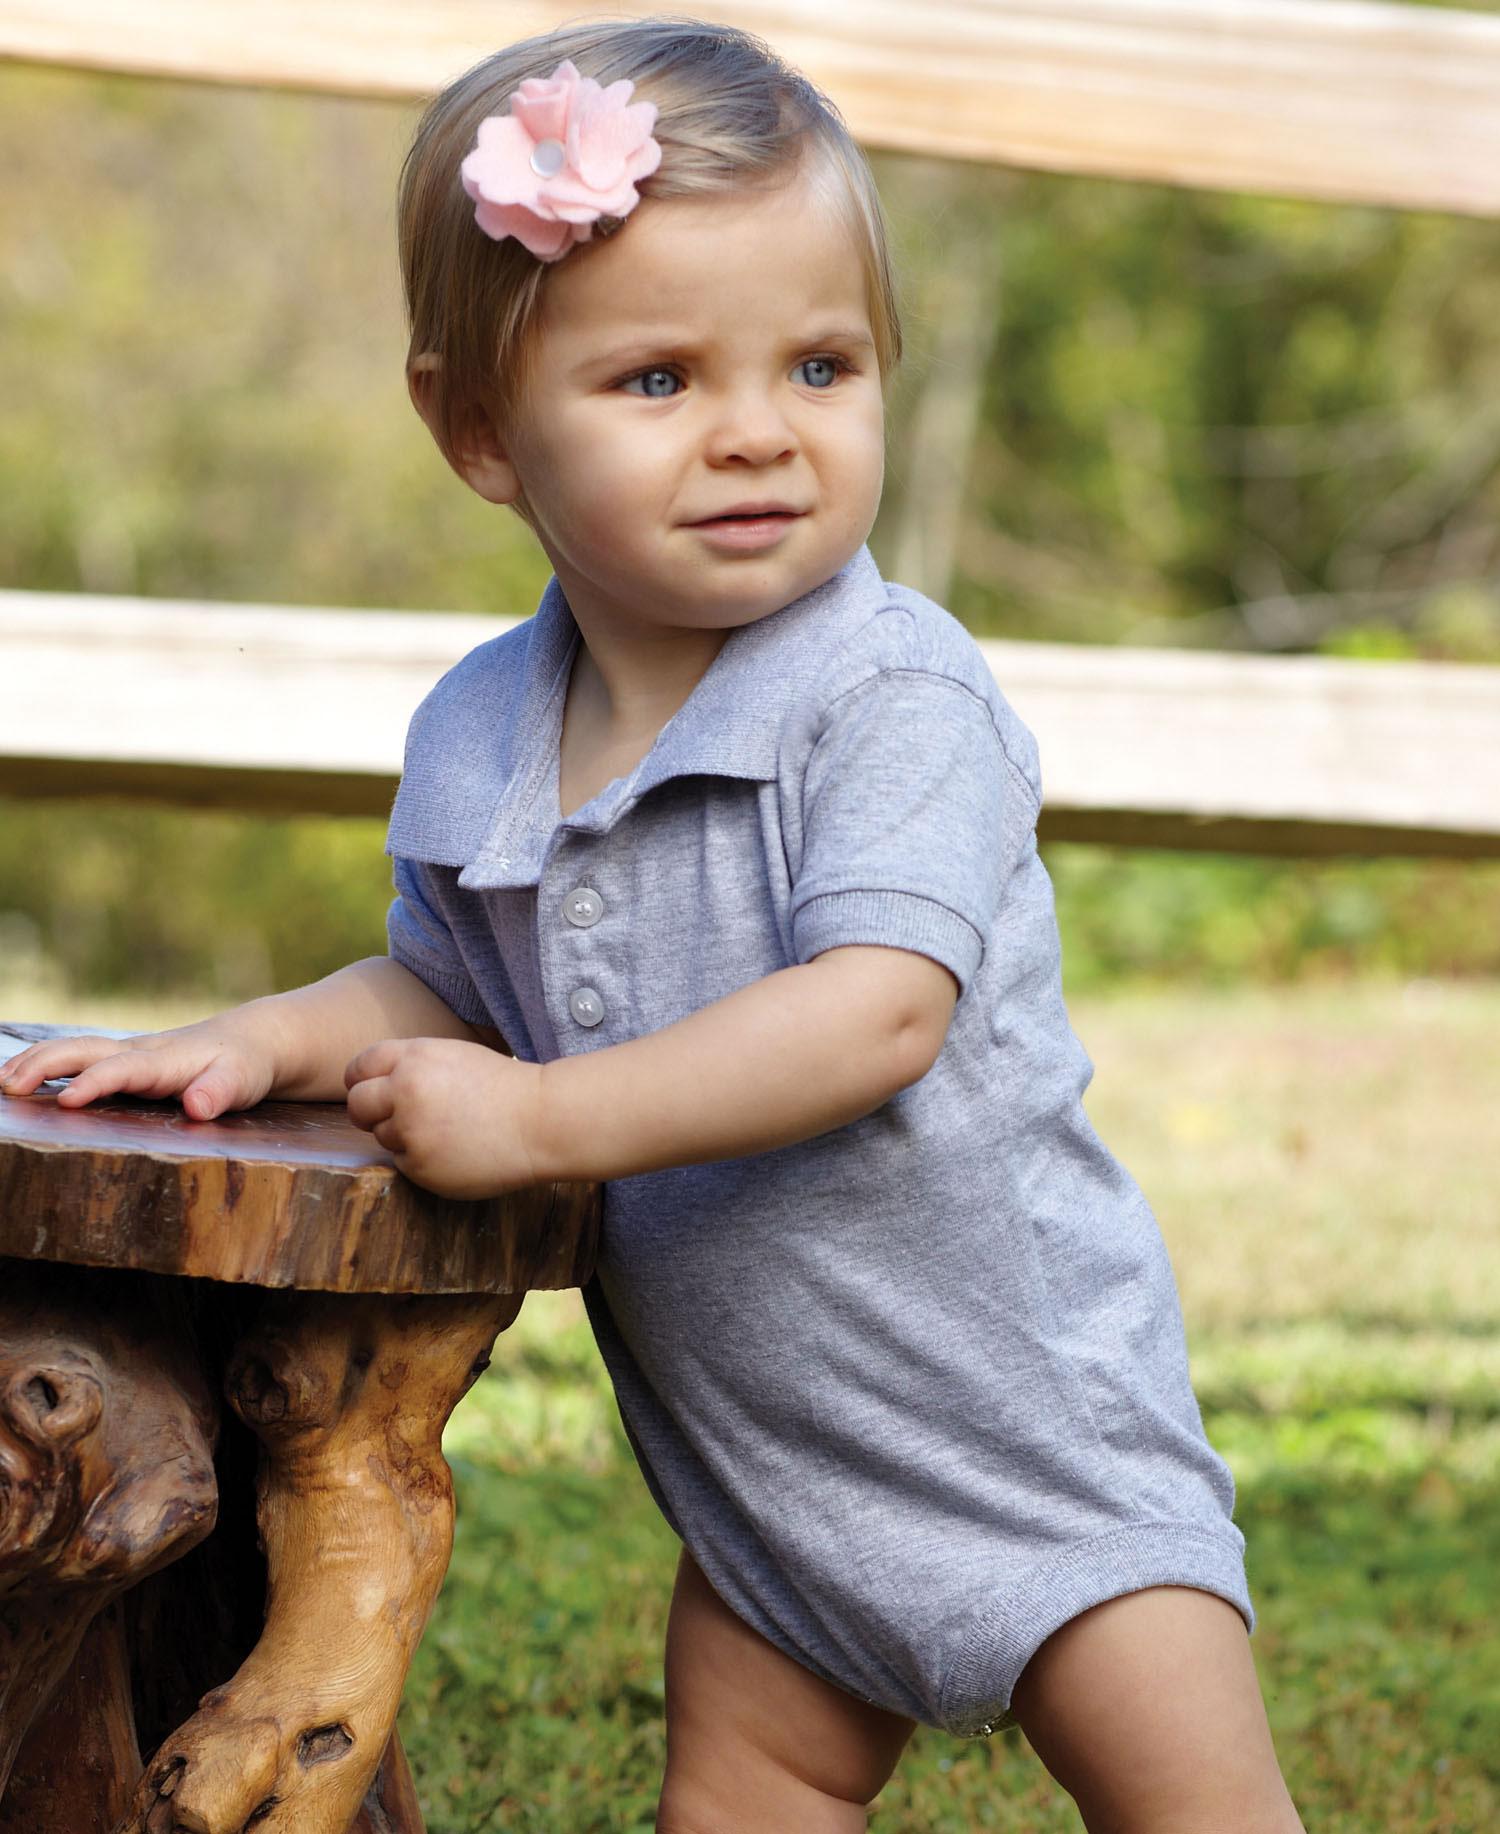 Rabbit Skins 4601 Infant Platinum Golf Shirt Creeper